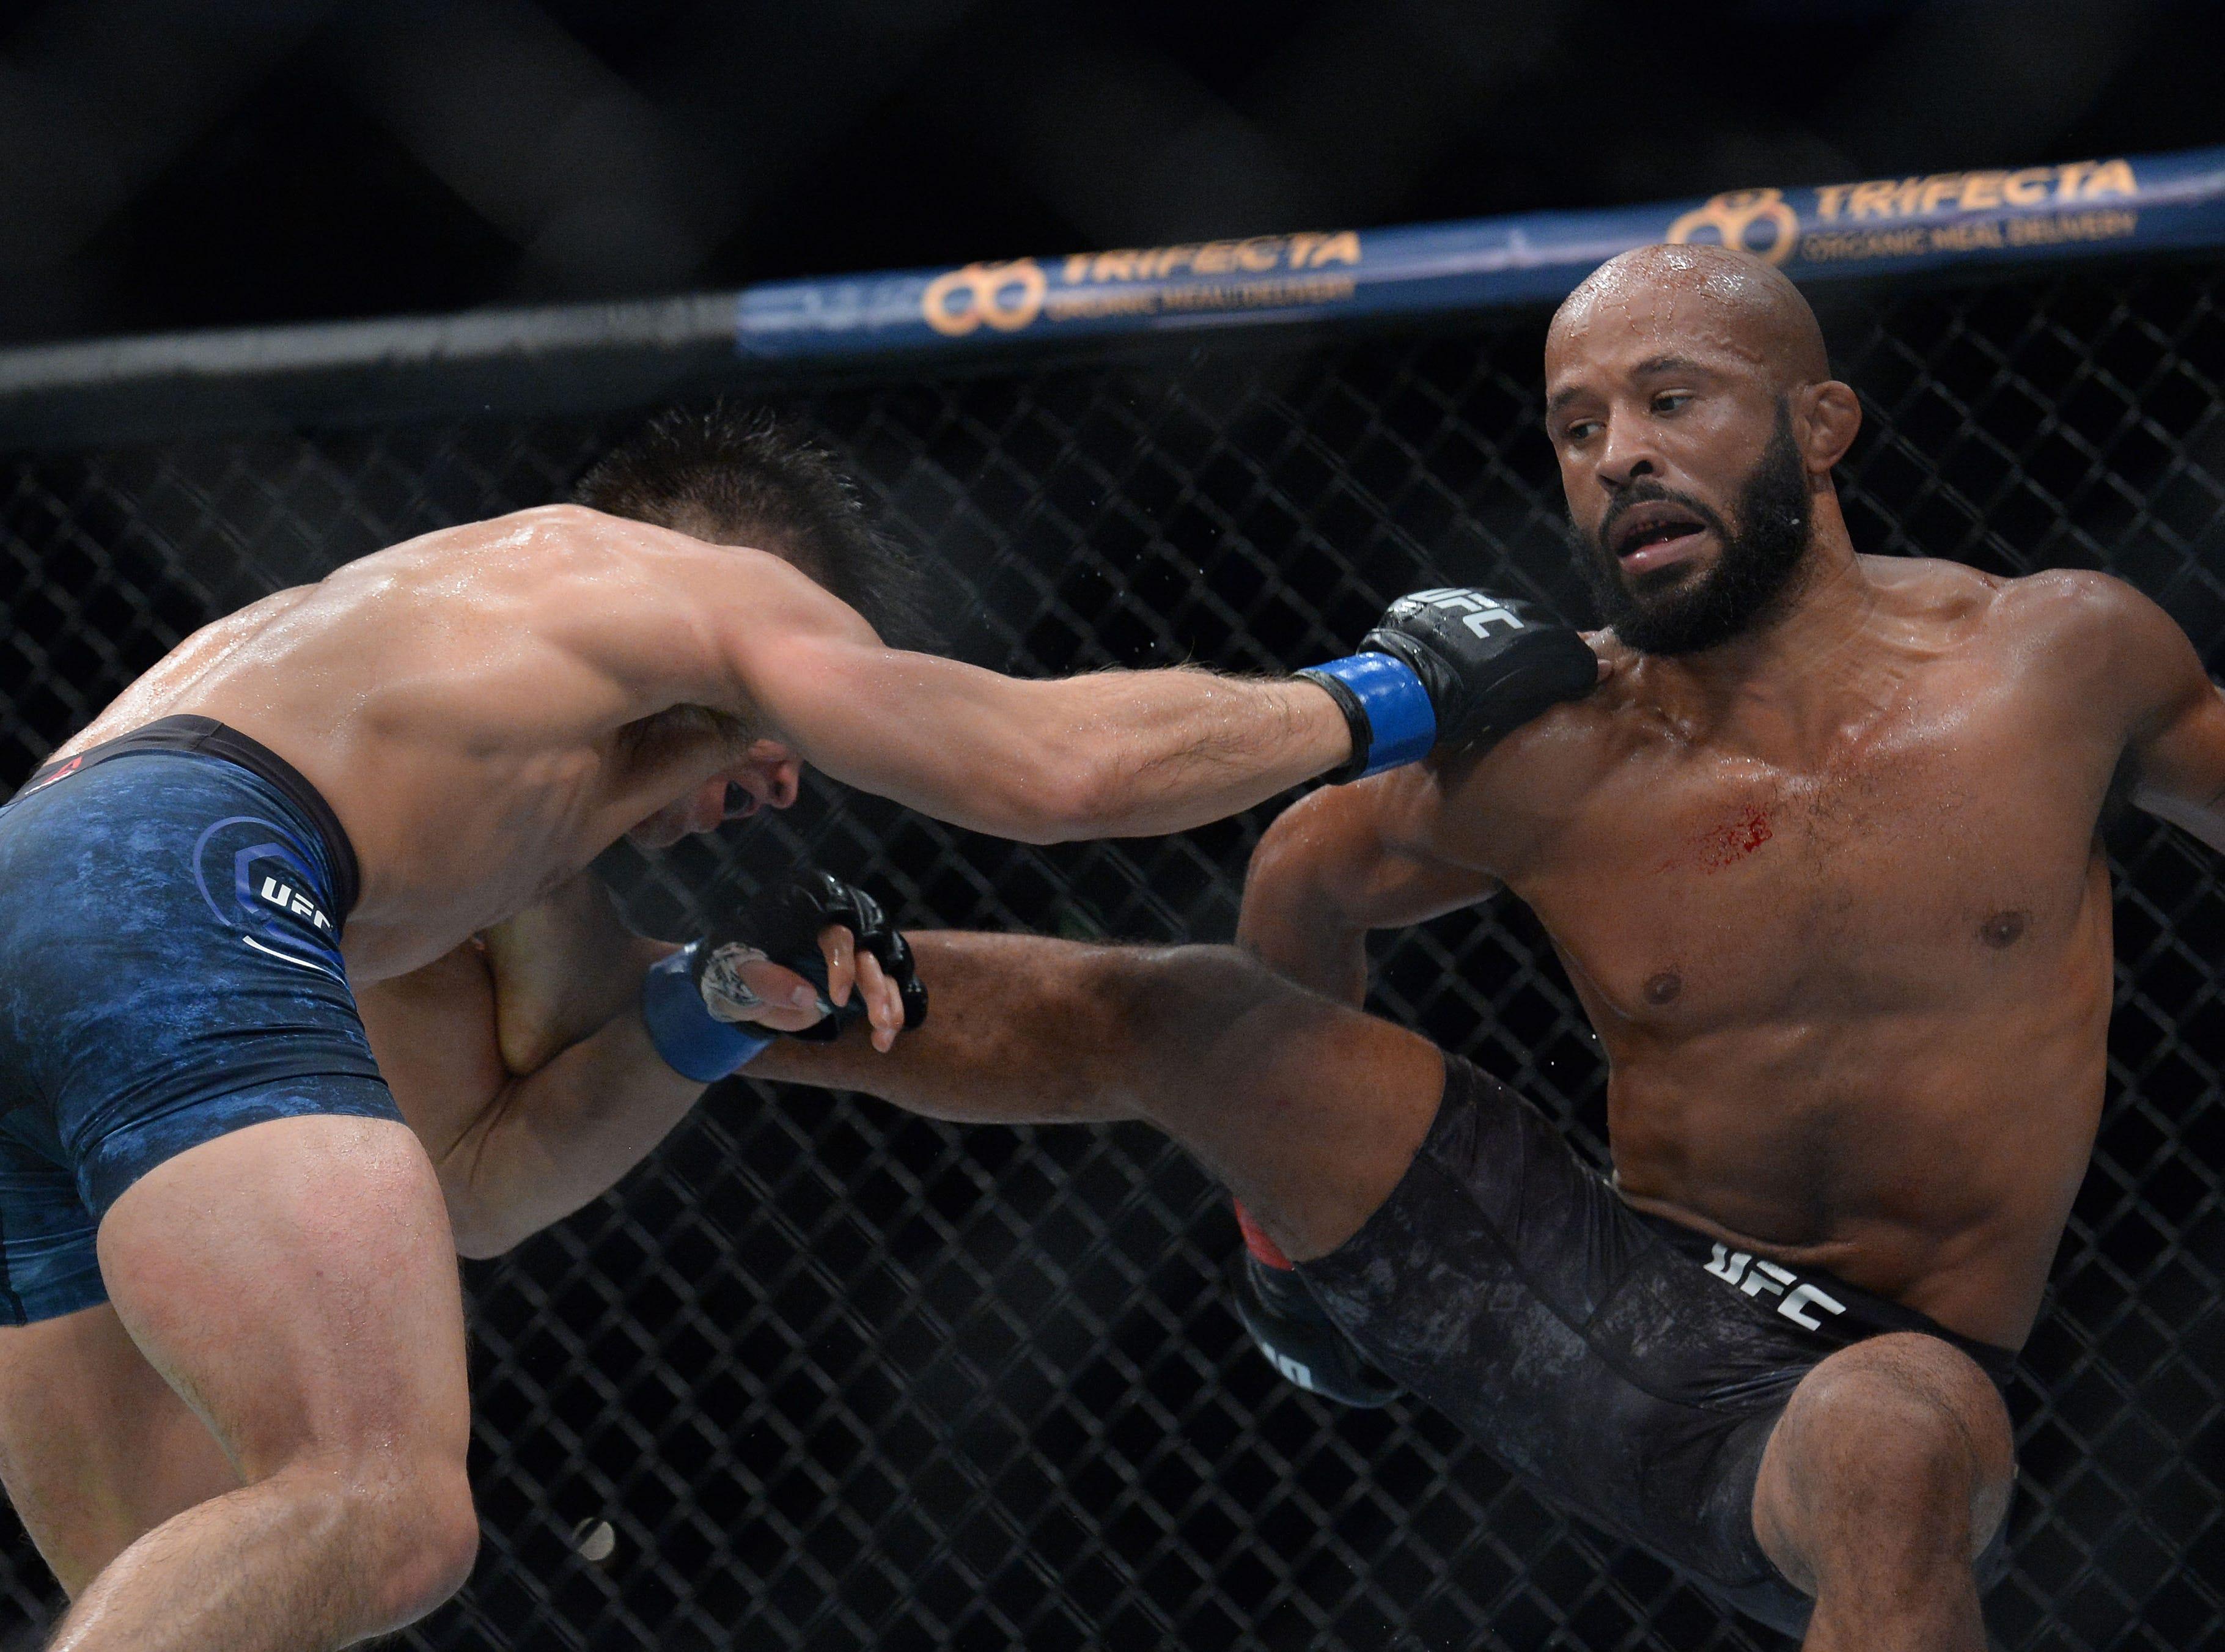 Henry Cejudo moves in against Demetrious Johnson during UFC 227 at Staples Center.